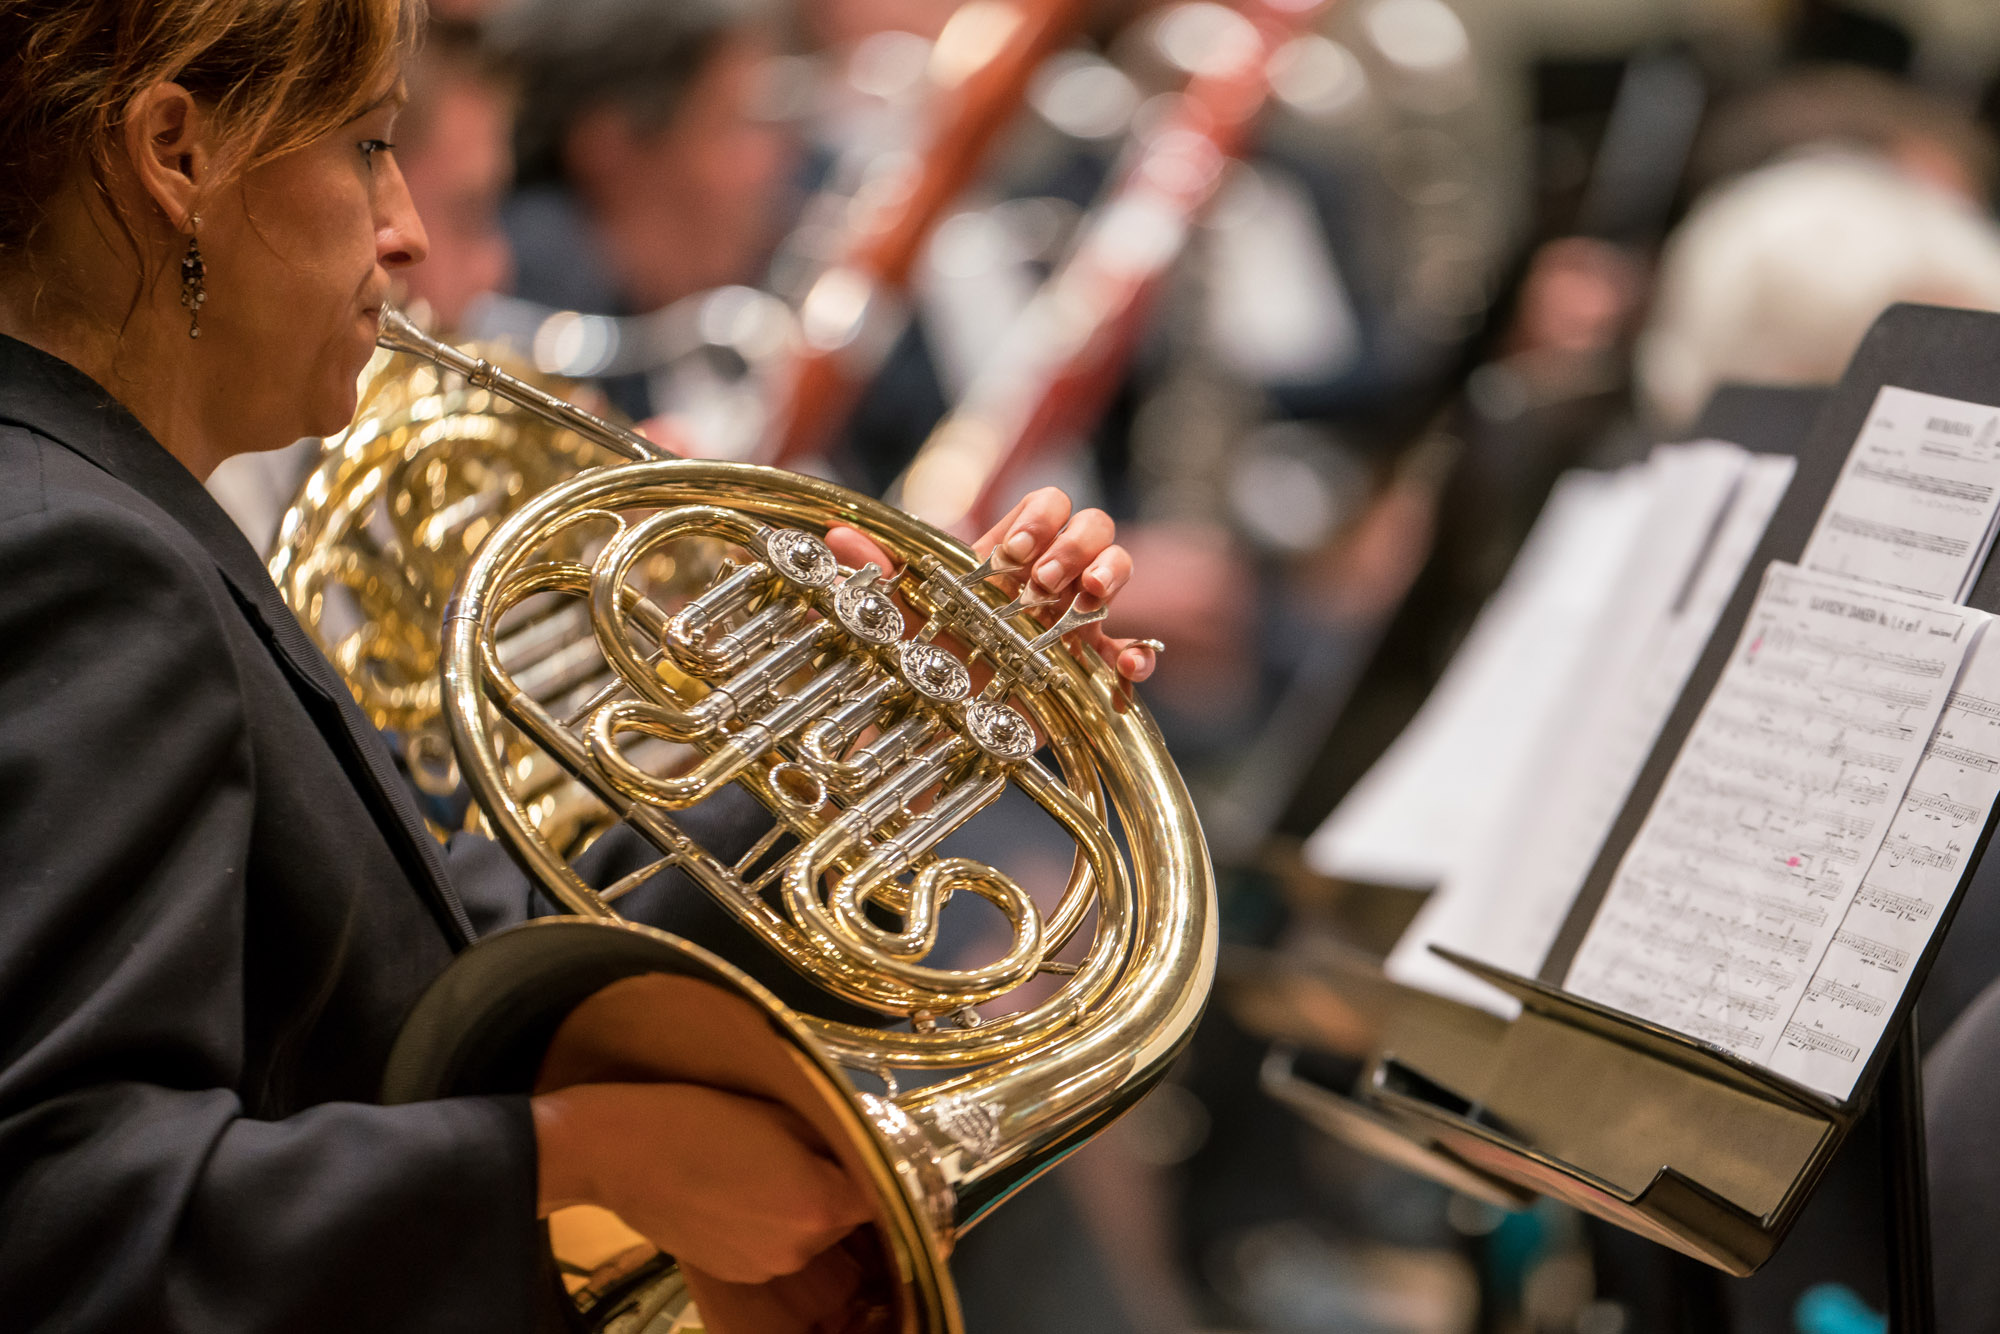 Concert i.s.m. Koninklijke Harmonie Sainte Cecile Eijsden